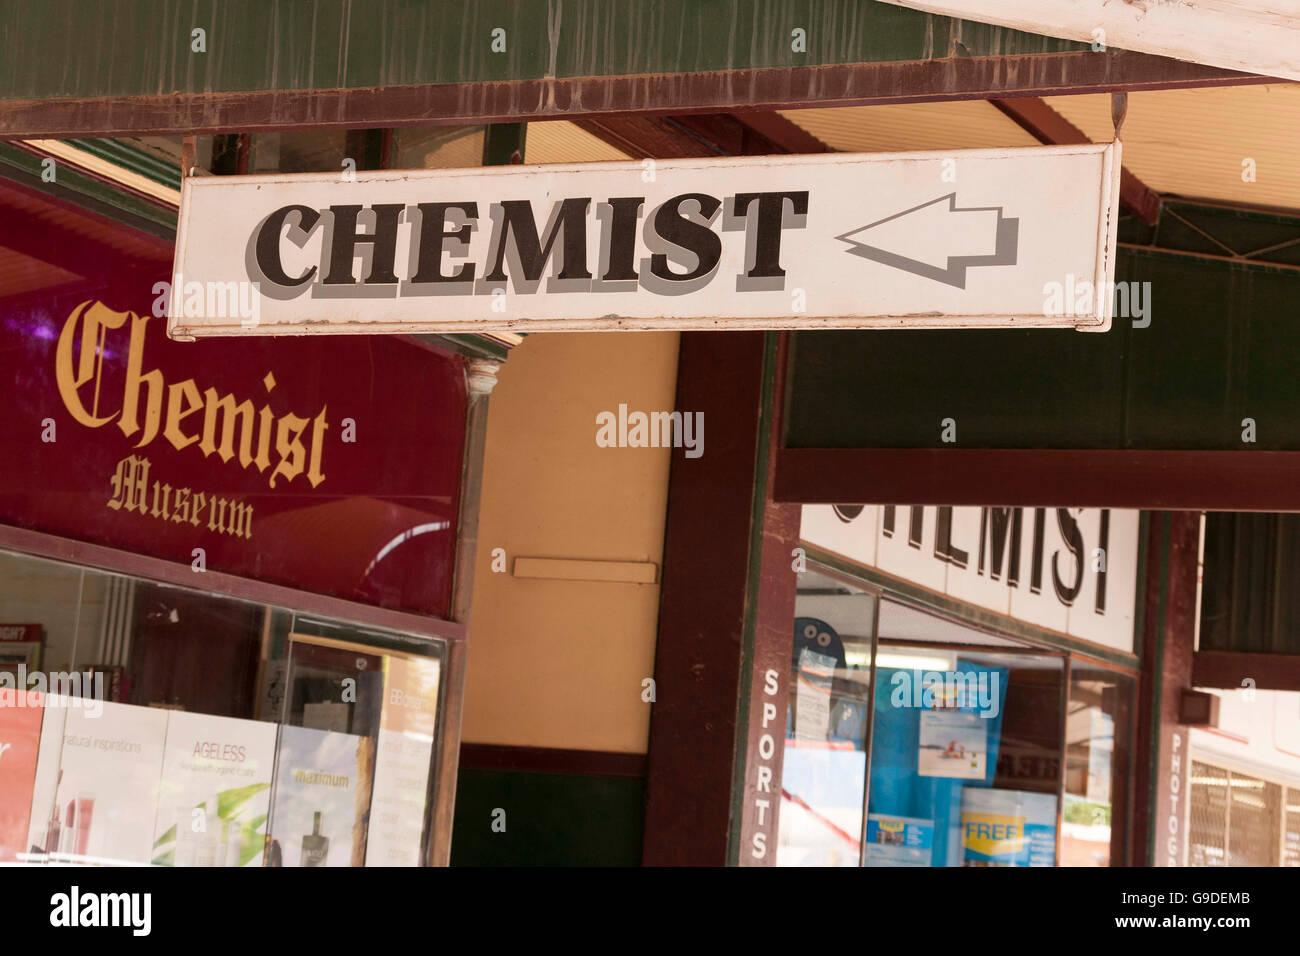 Chemist shop sign,  Western Australia - Stock Image